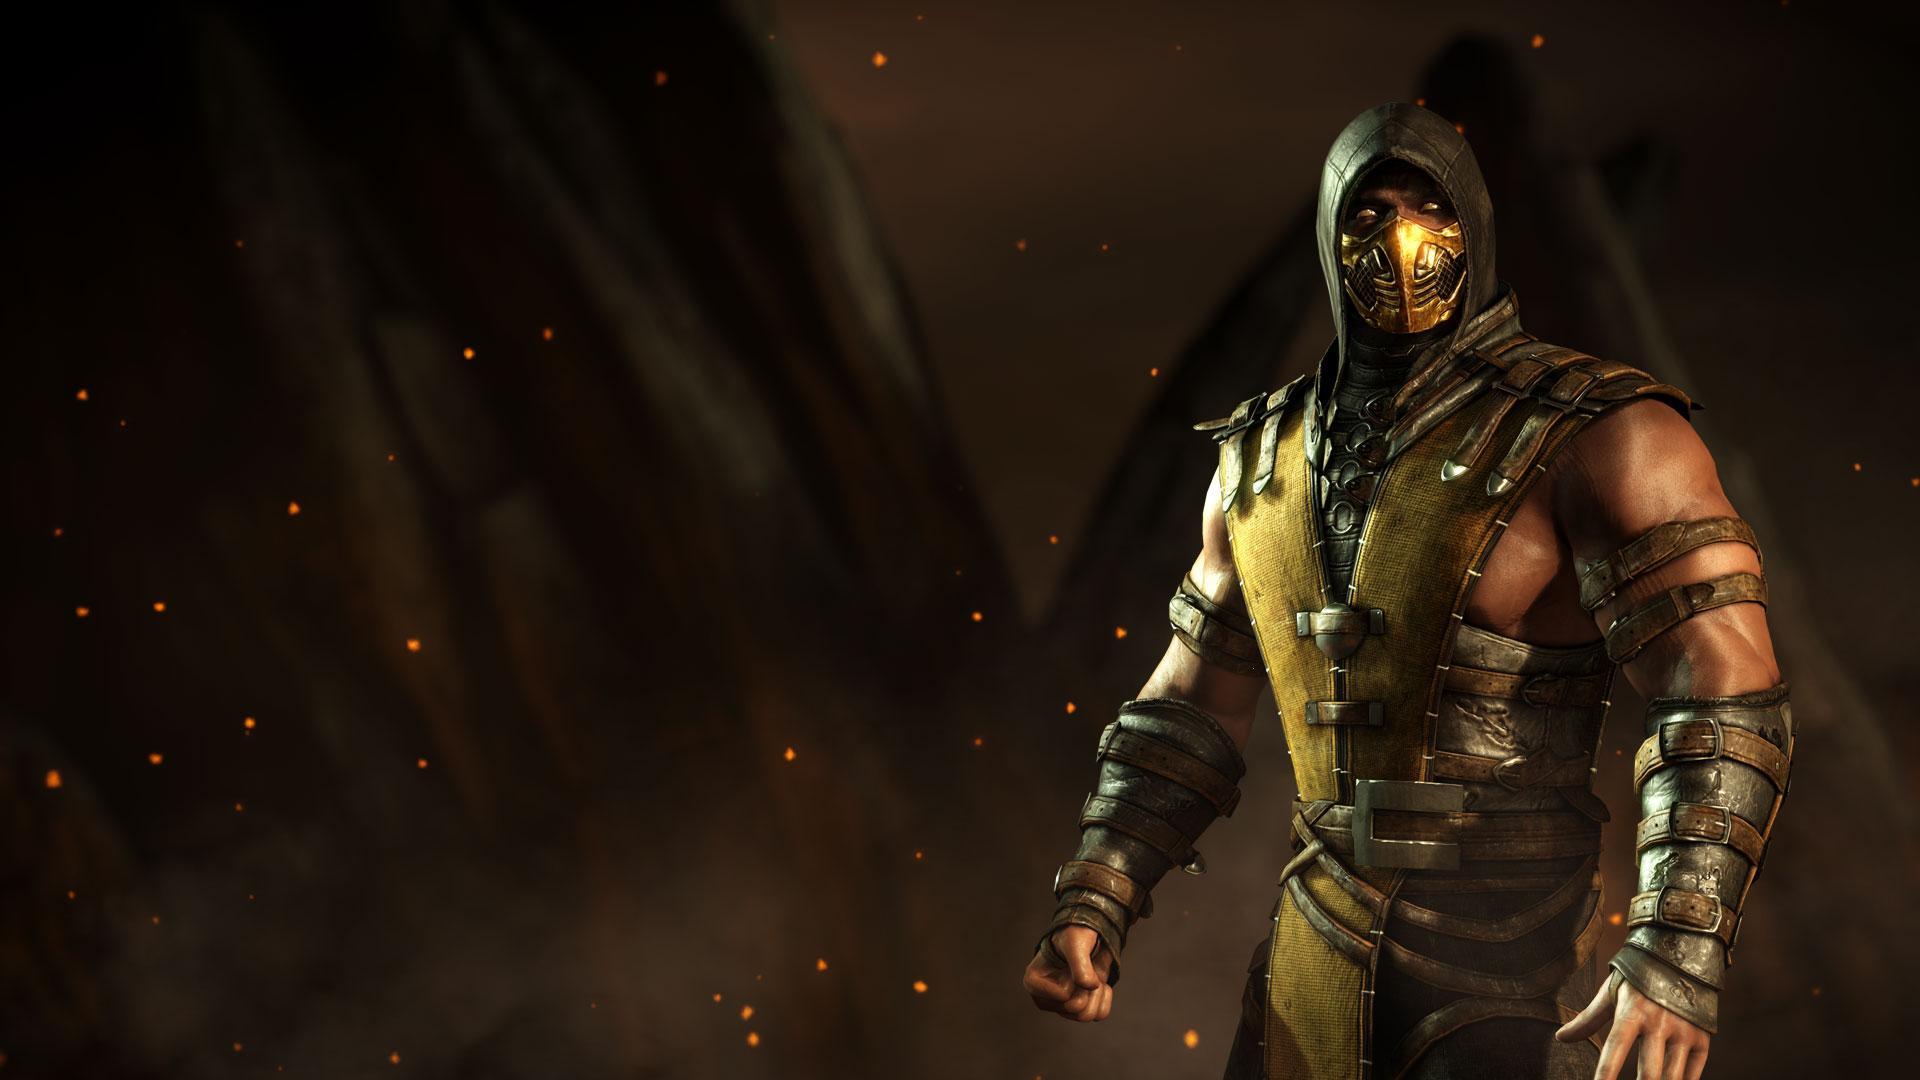 Amazon.com: Mortal Kombat X: Kollector's Edition - PlayStation 4